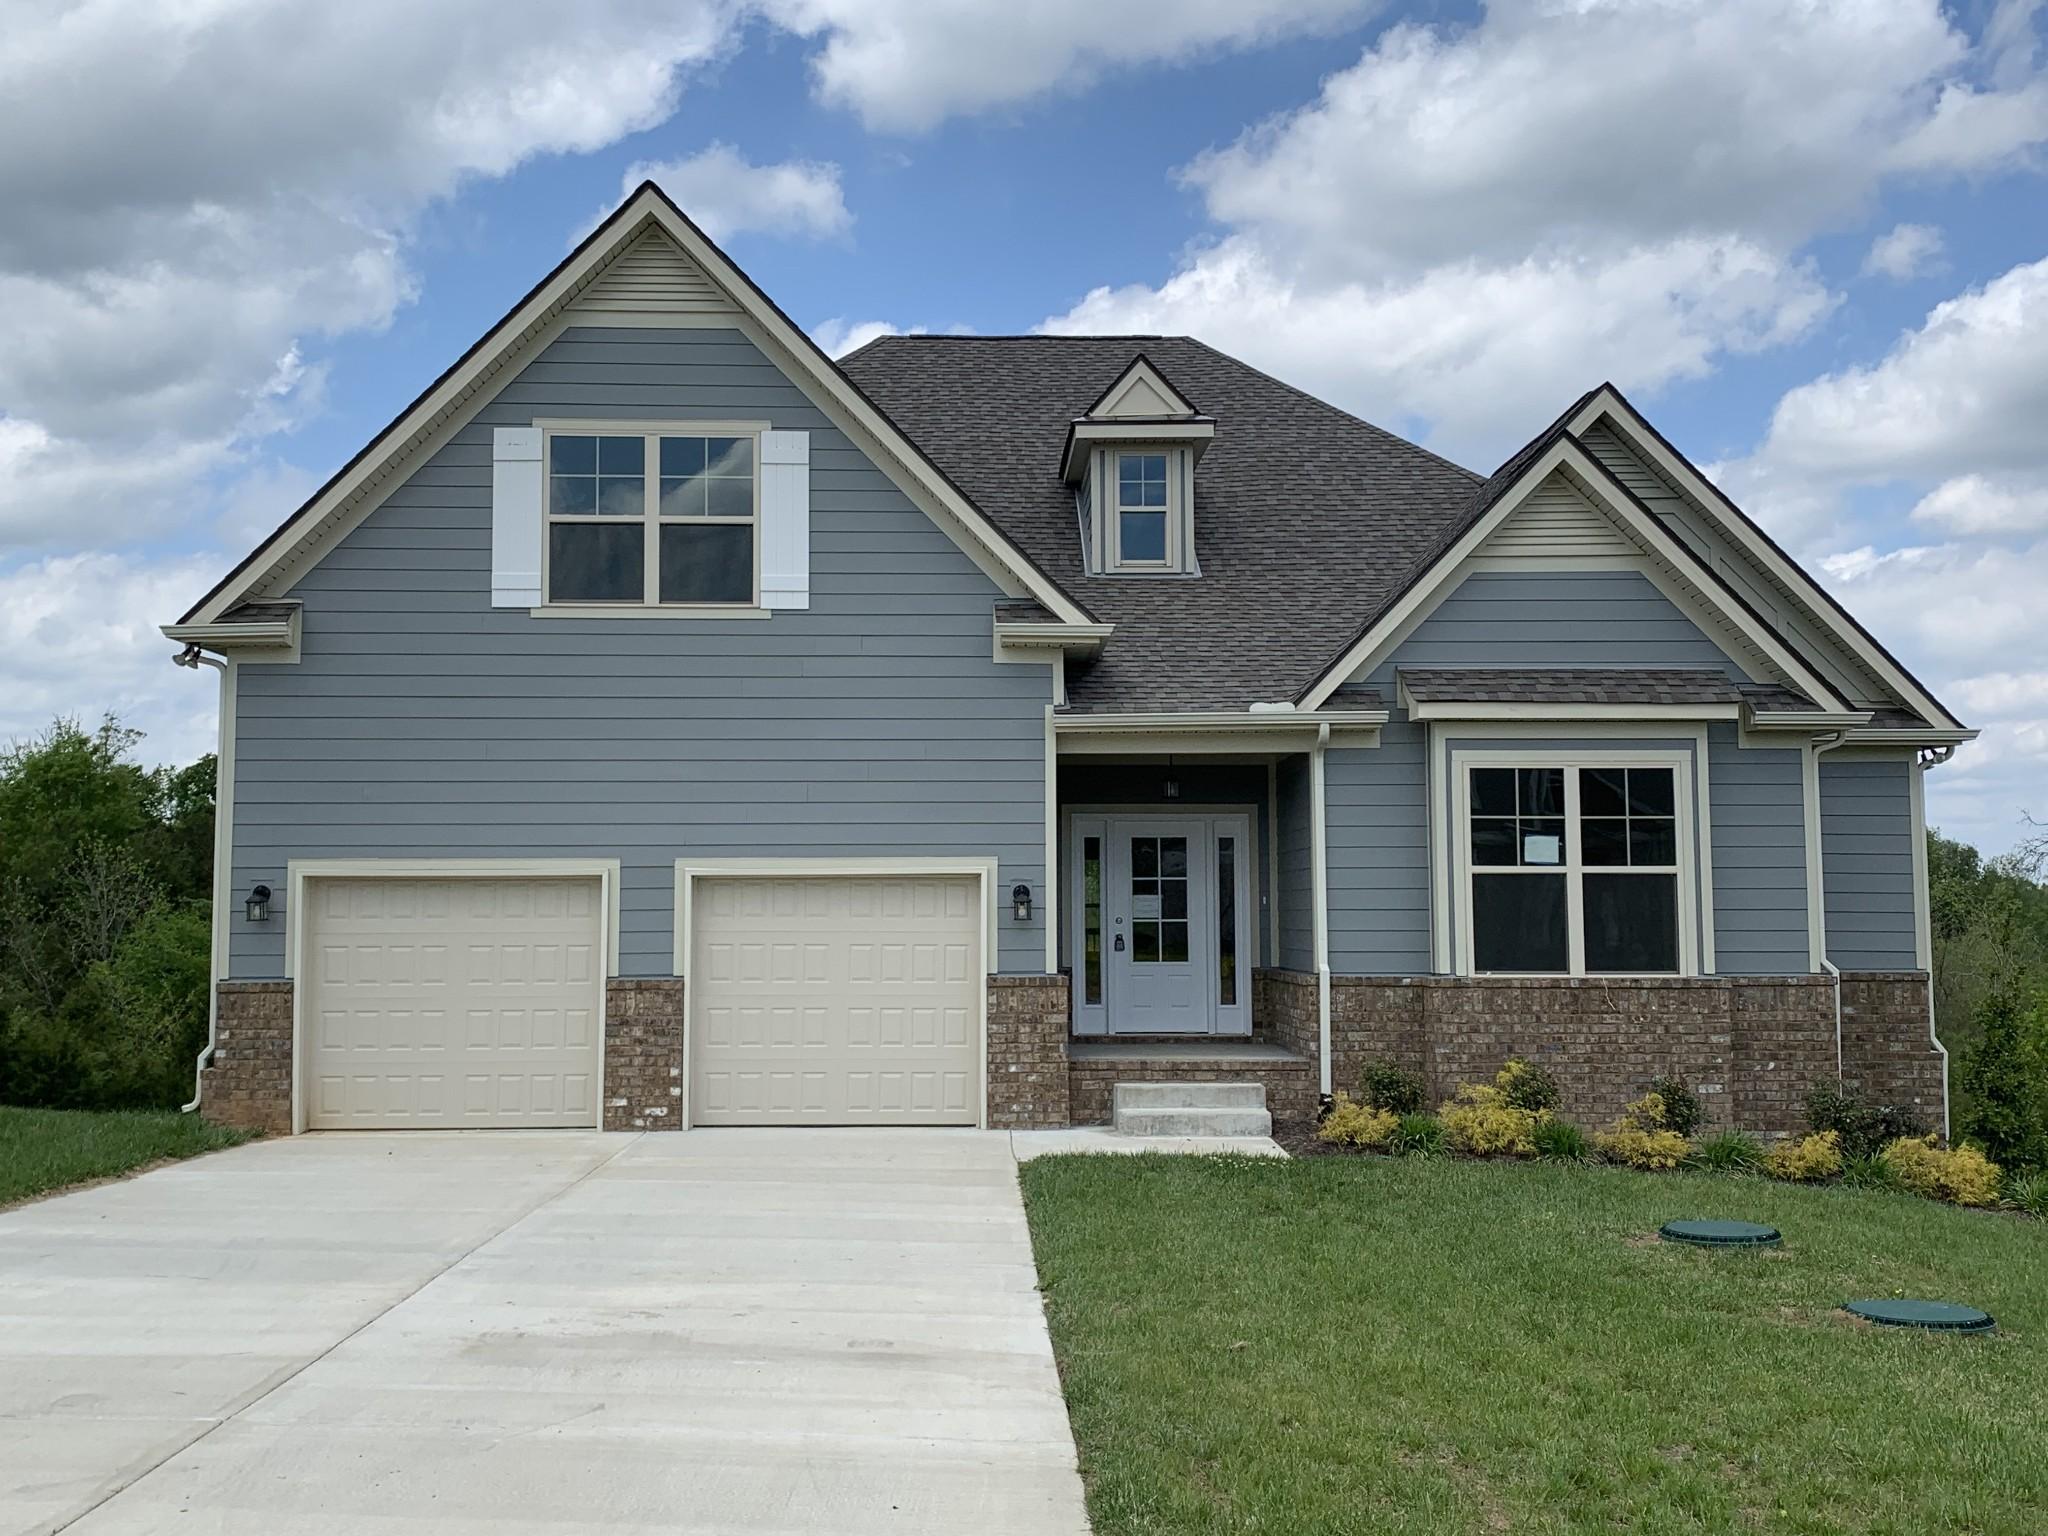 1114 Batbriar Rd #4, Murfreesboro, TN 37128 - Murfreesboro, TN real estate listing